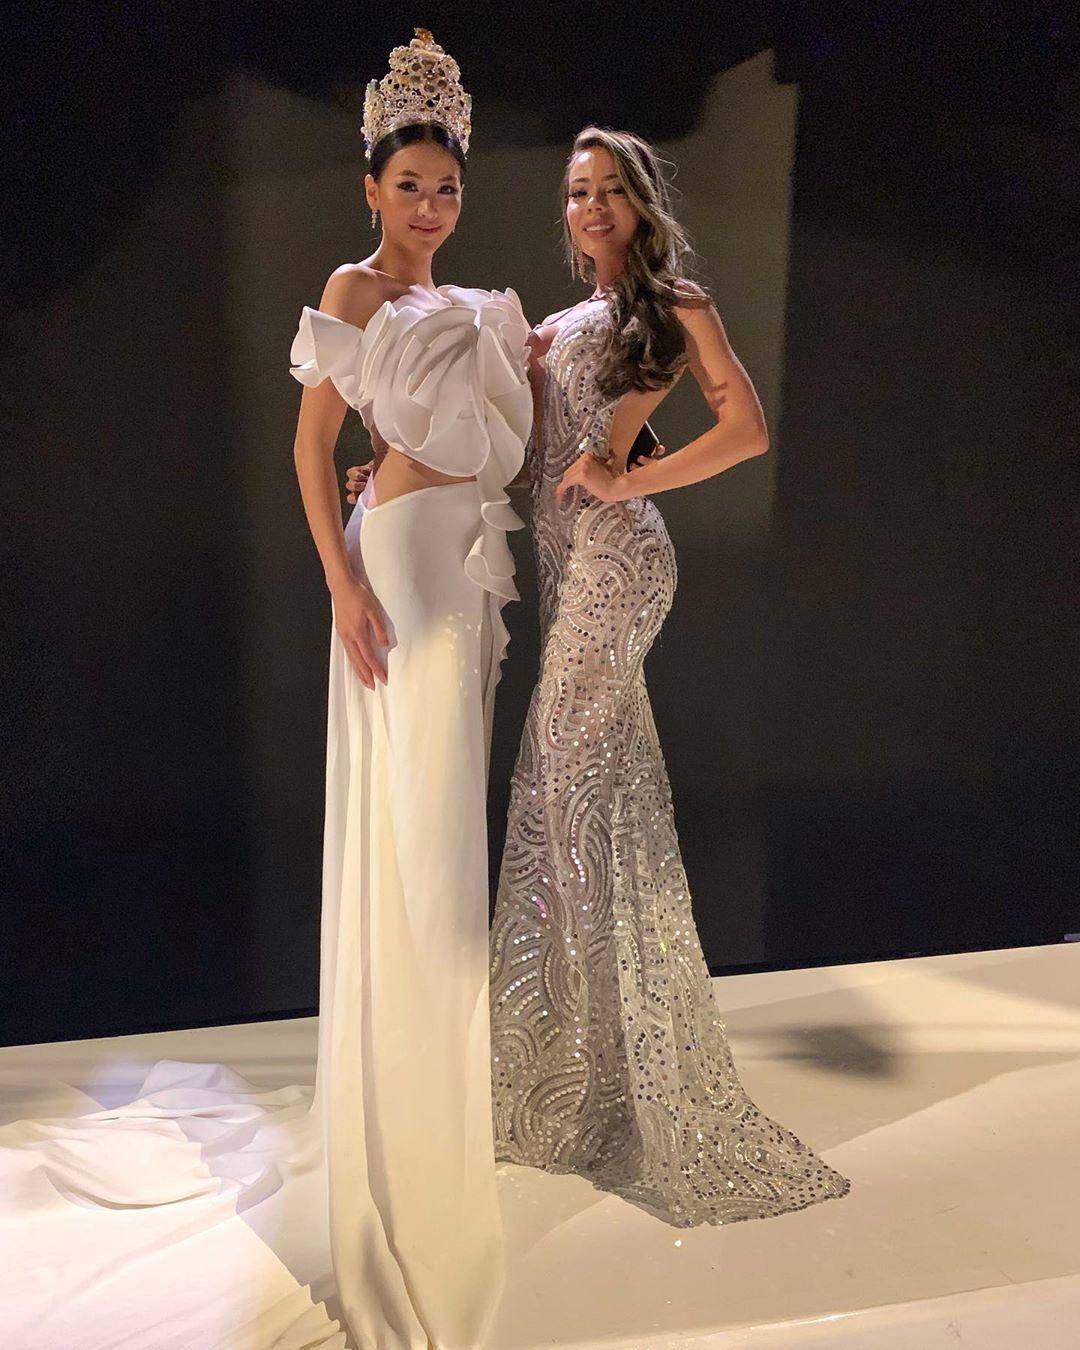 gina aguirre, virreyna de miss latinoamerica 2019. - Página 3 67562010